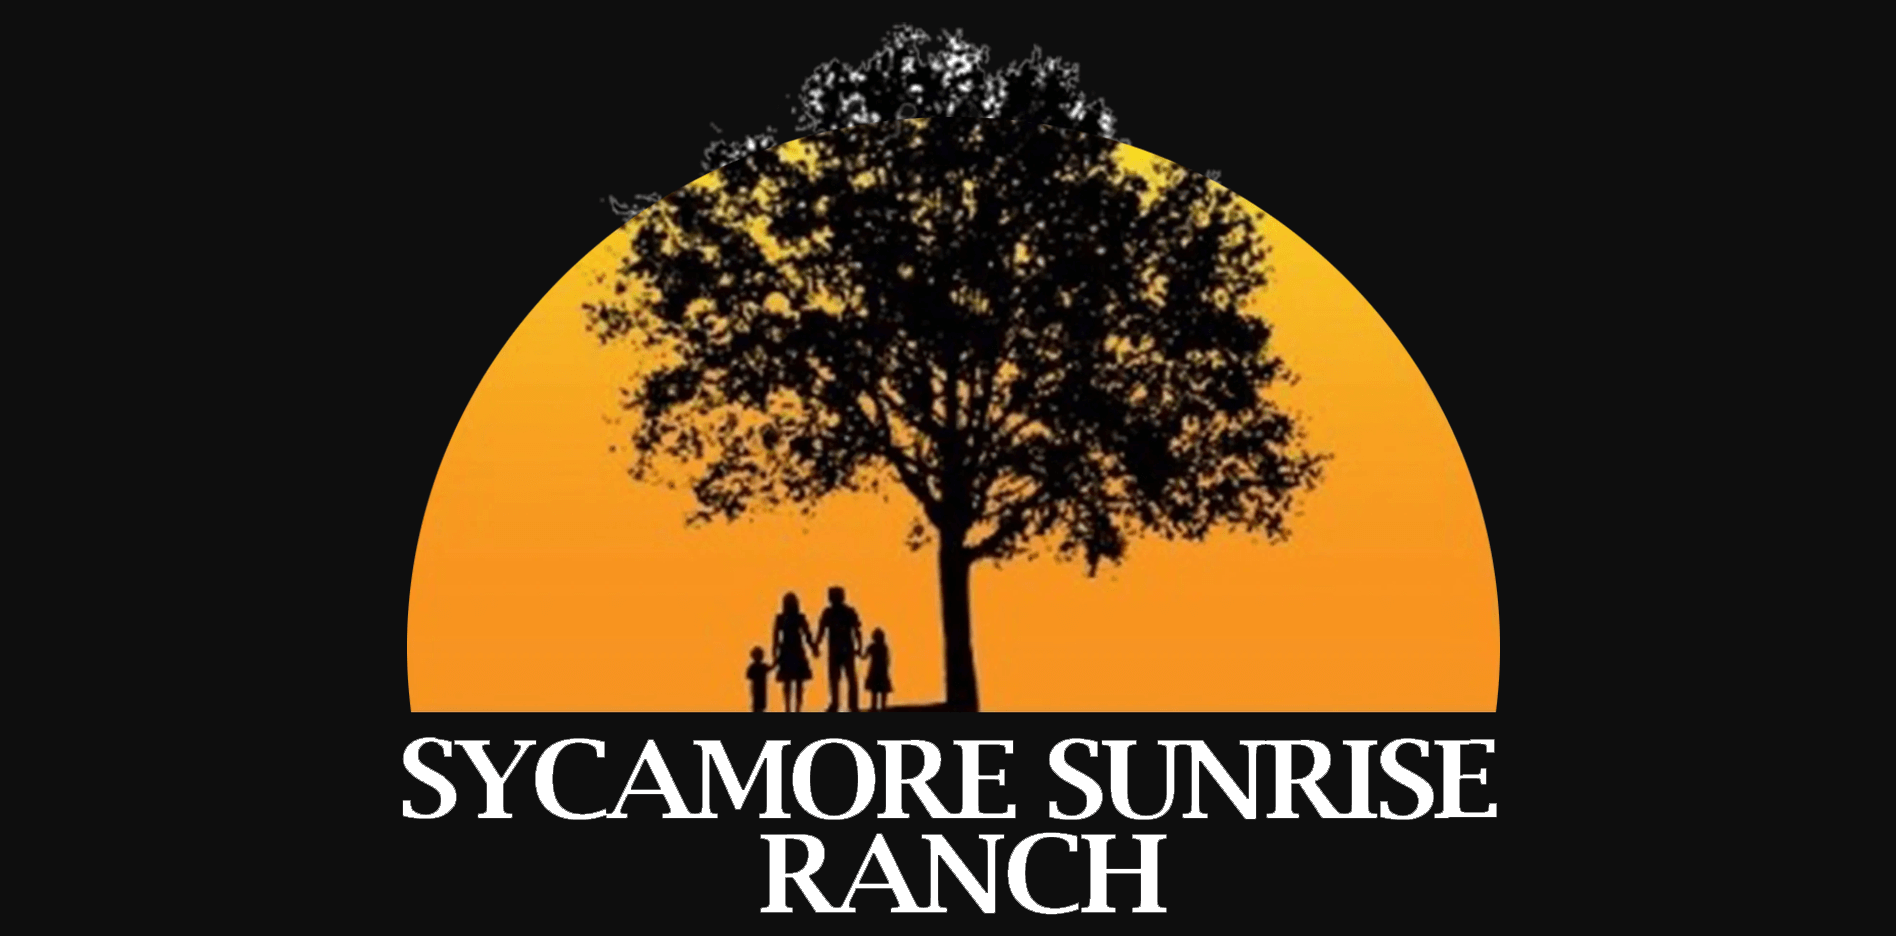 Sycamore Sunrise Ranch